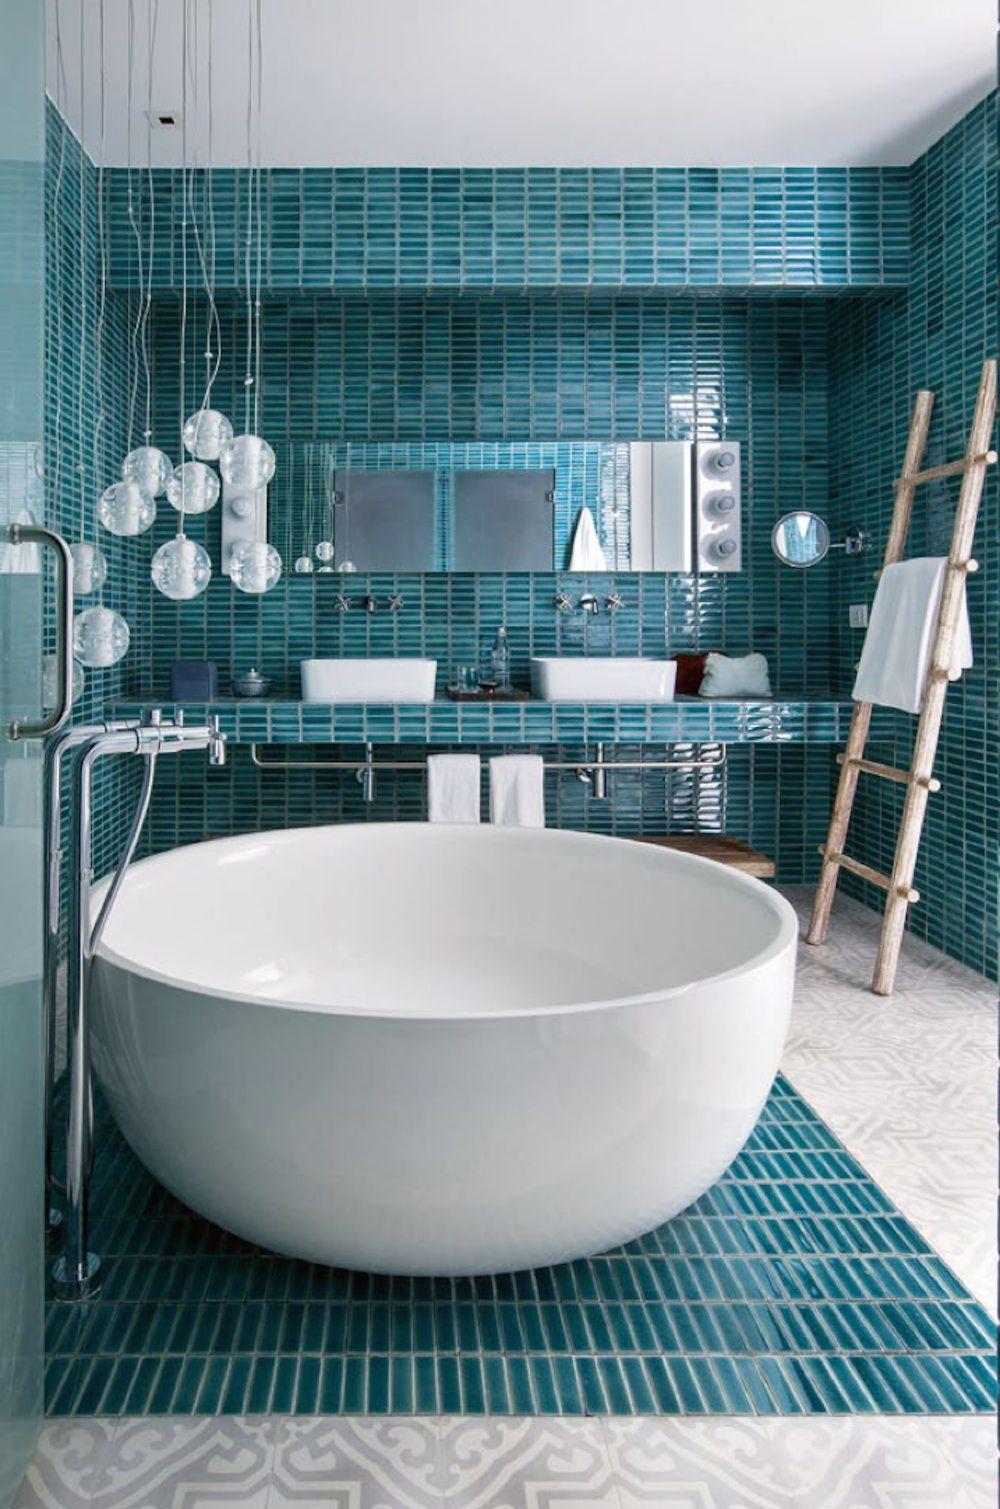 Paola Navone S Point Yamu By Como Phuket Bathroom Trends Bathtub Design Bathroom Design